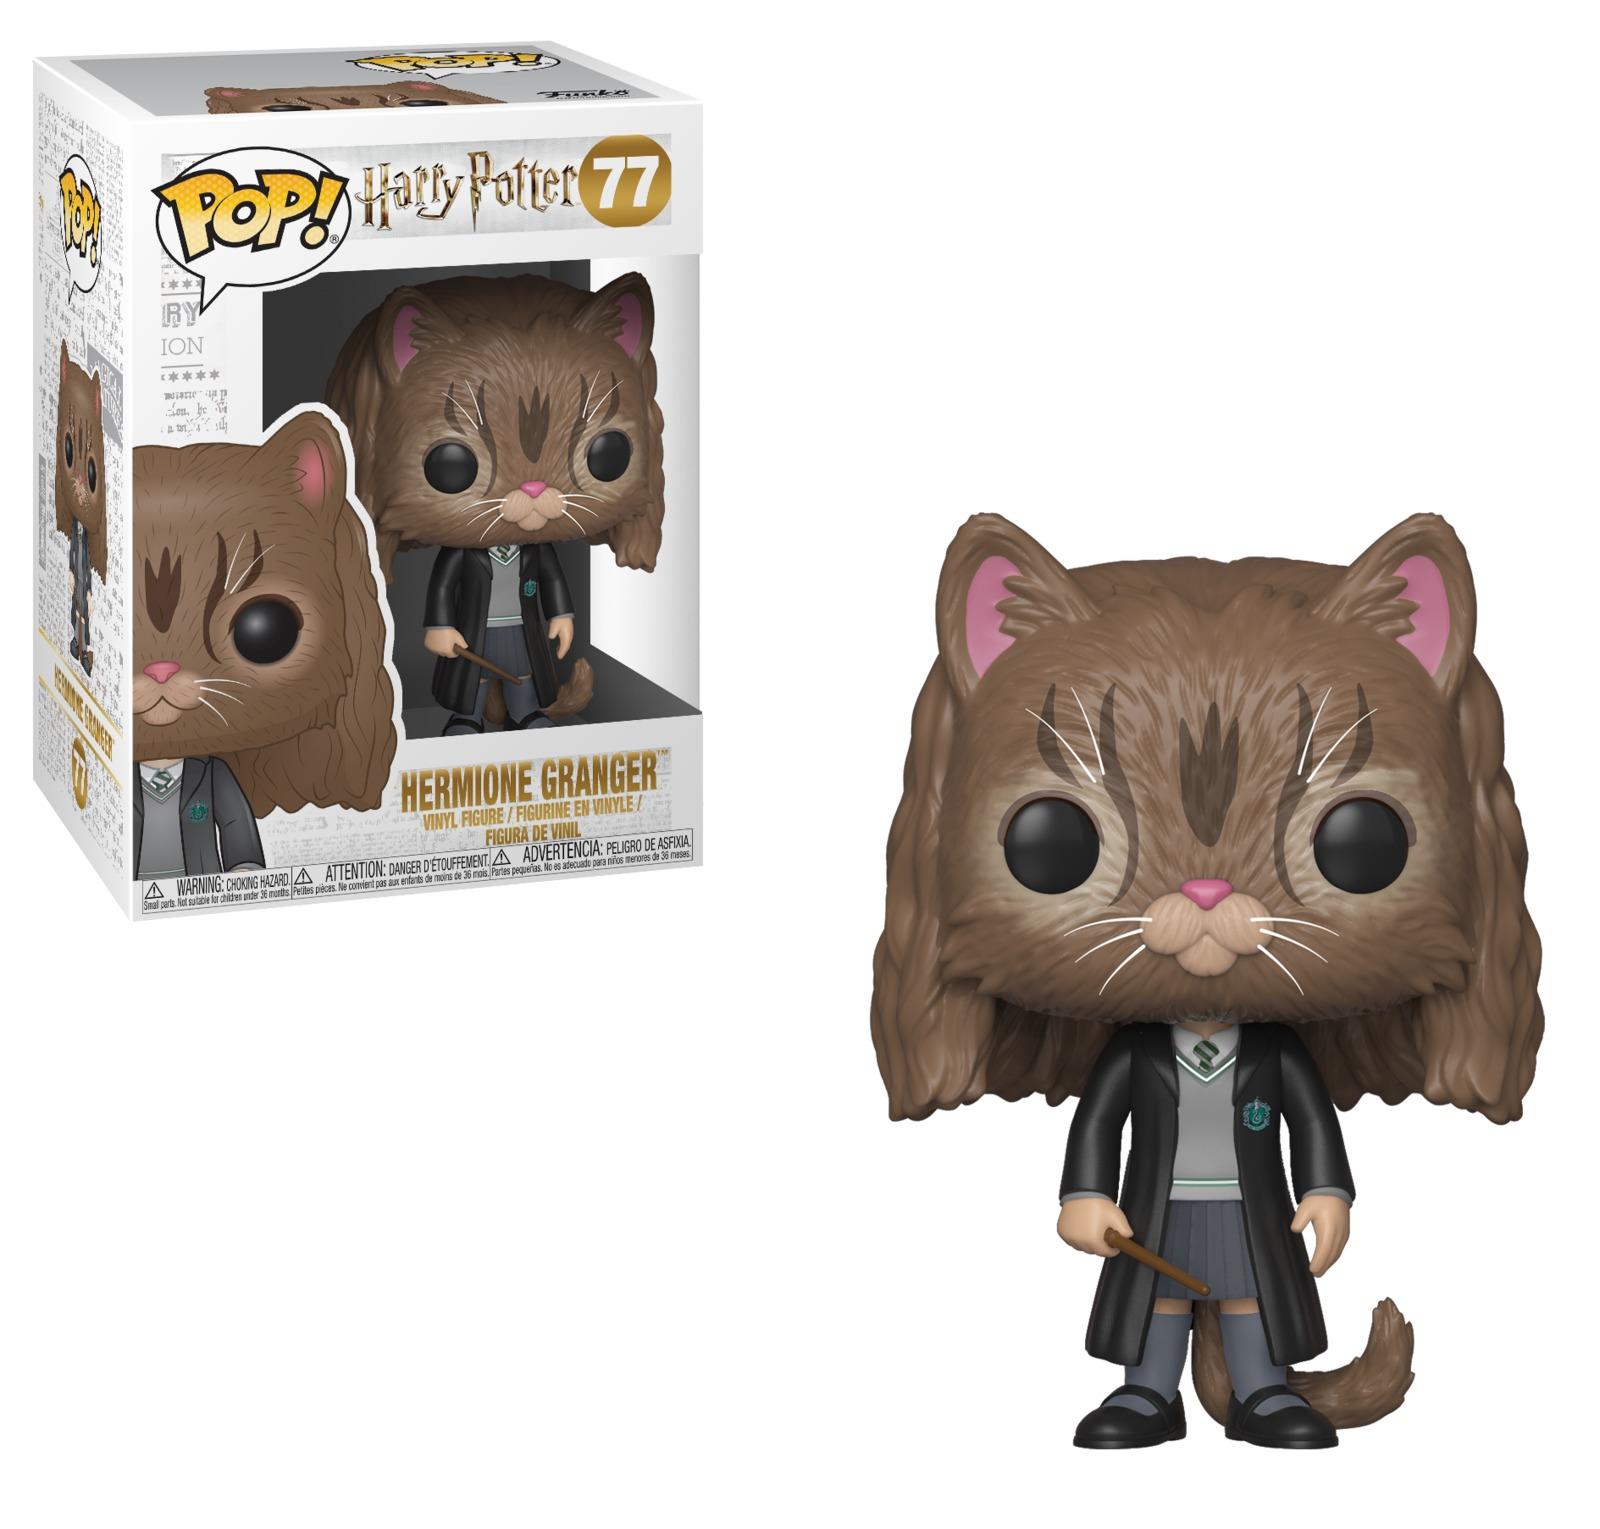 Harry Potter - Hermione Granger (Polyjuice) Pop! Vinyl Figure image